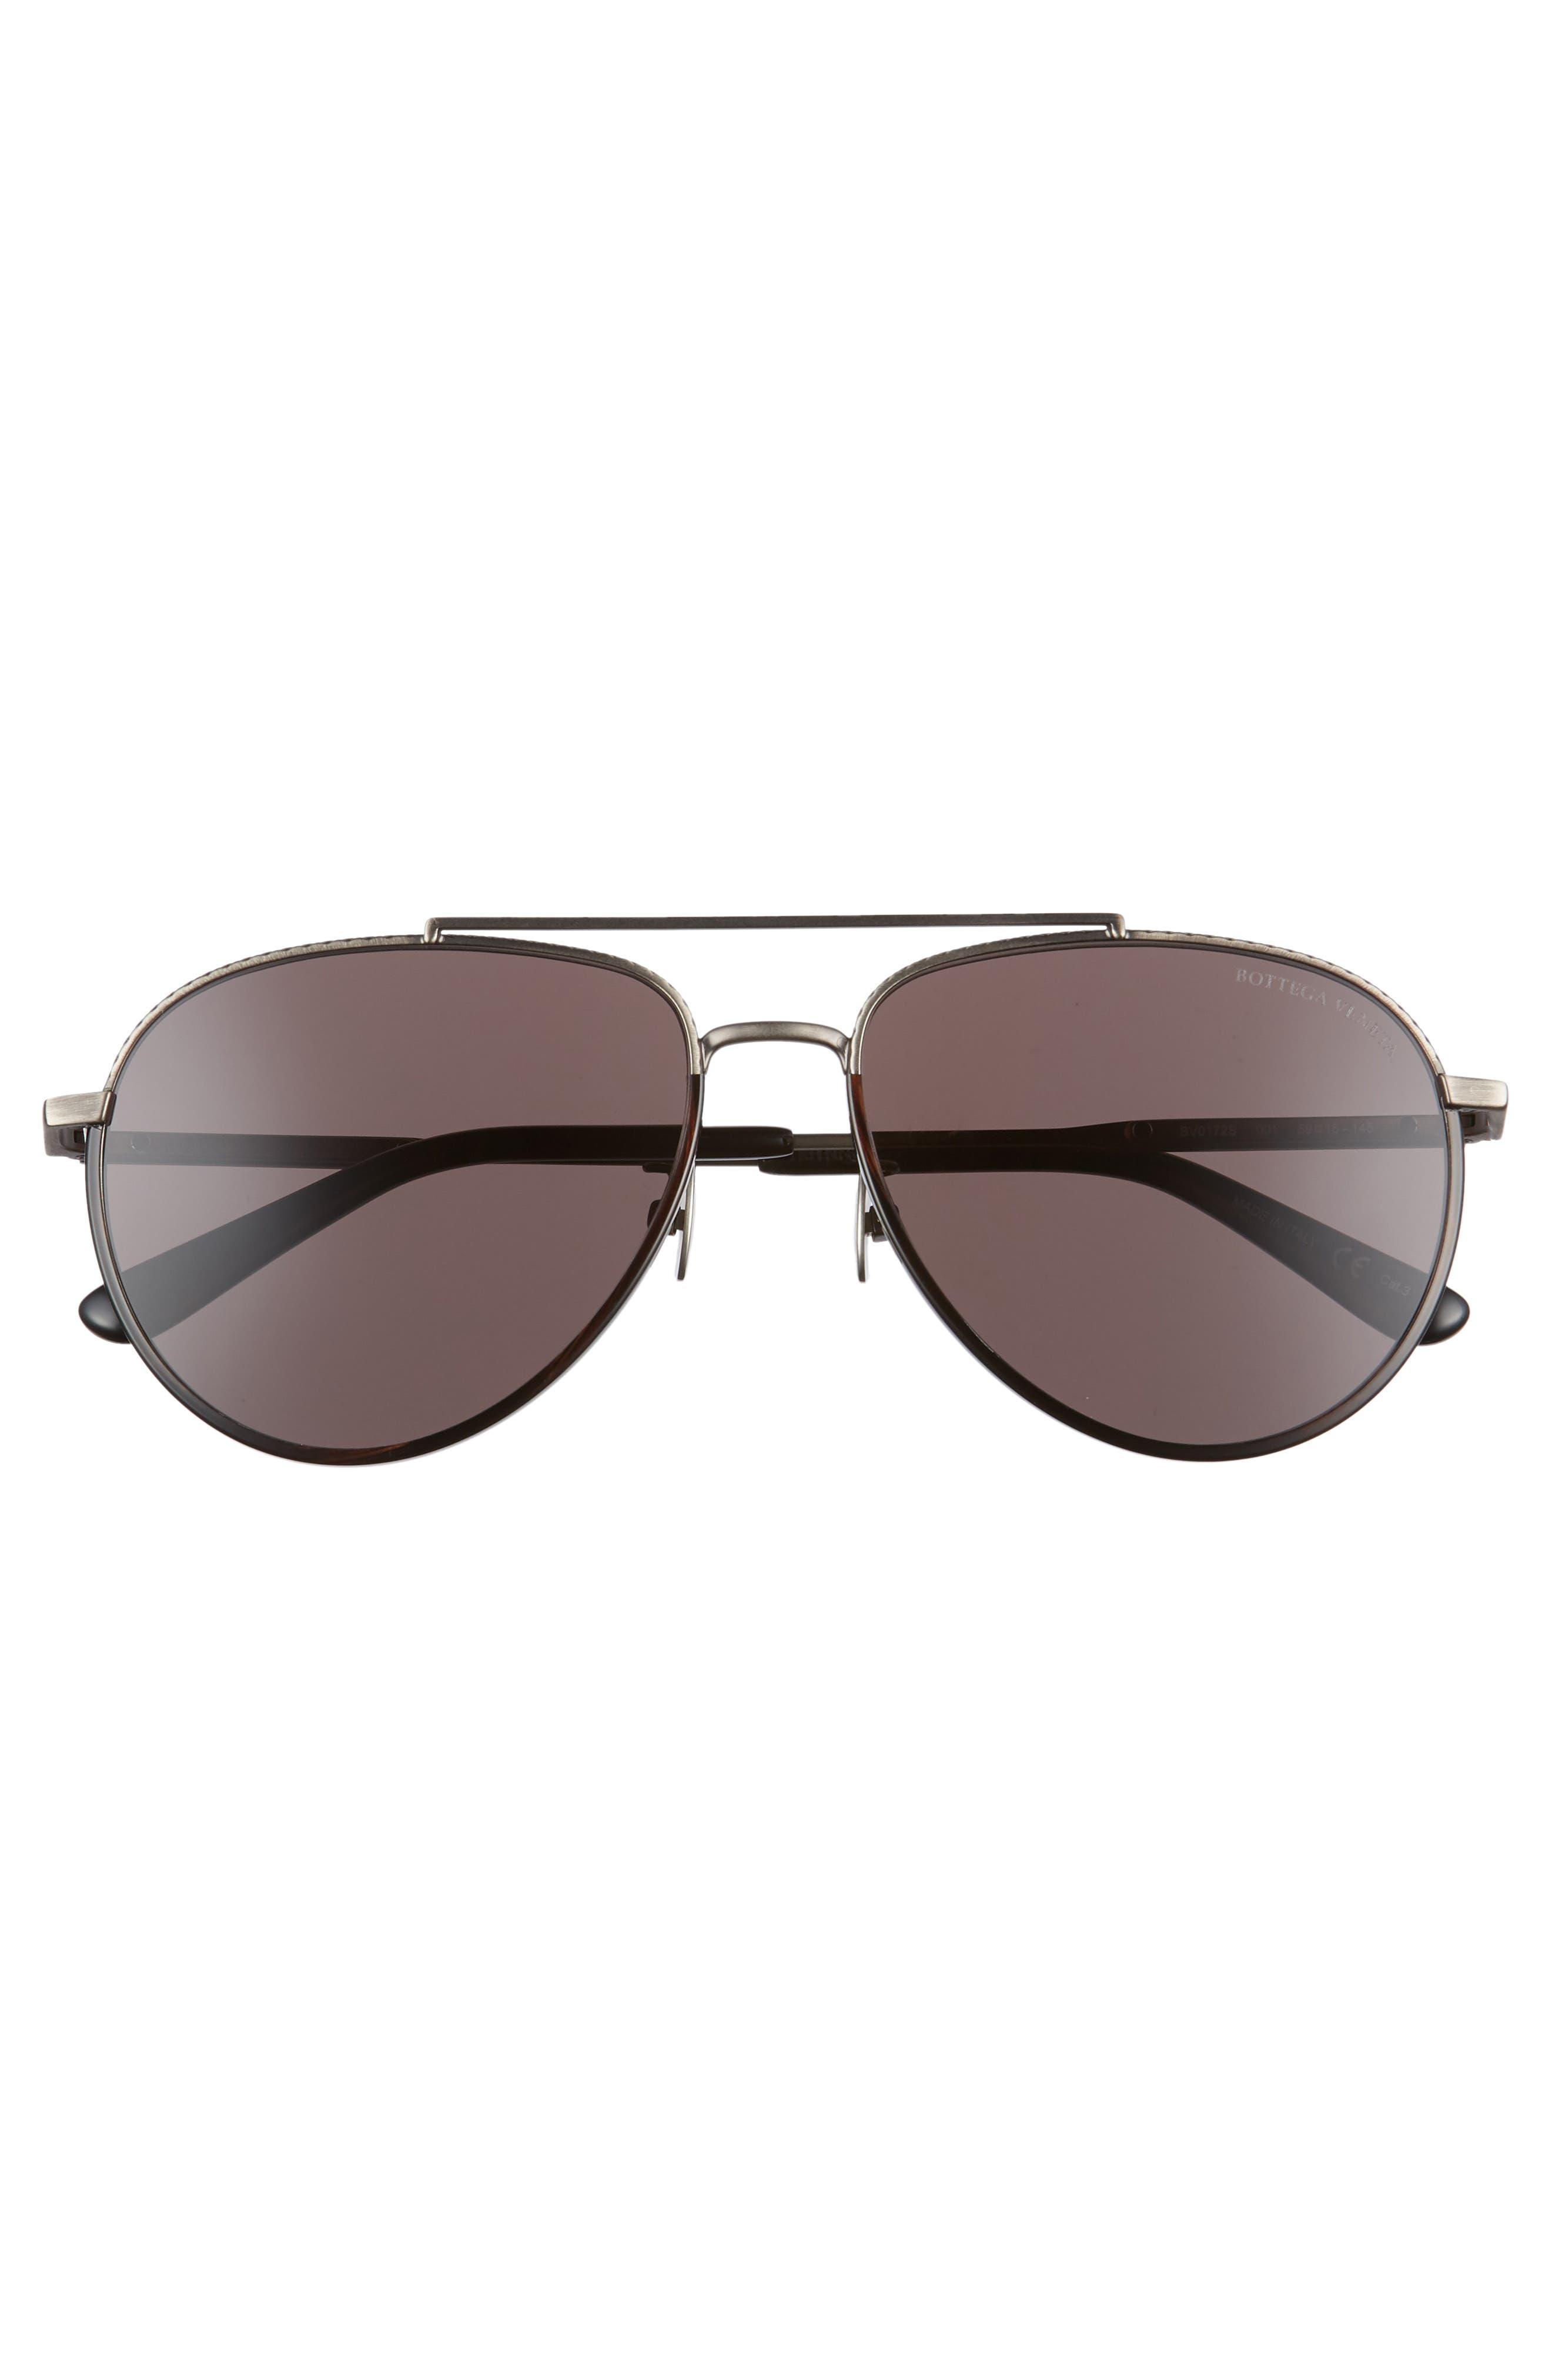 59mm Aviator Sunglasses,                             Alternate thumbnail 3, color,                             SILVER/ BLACK